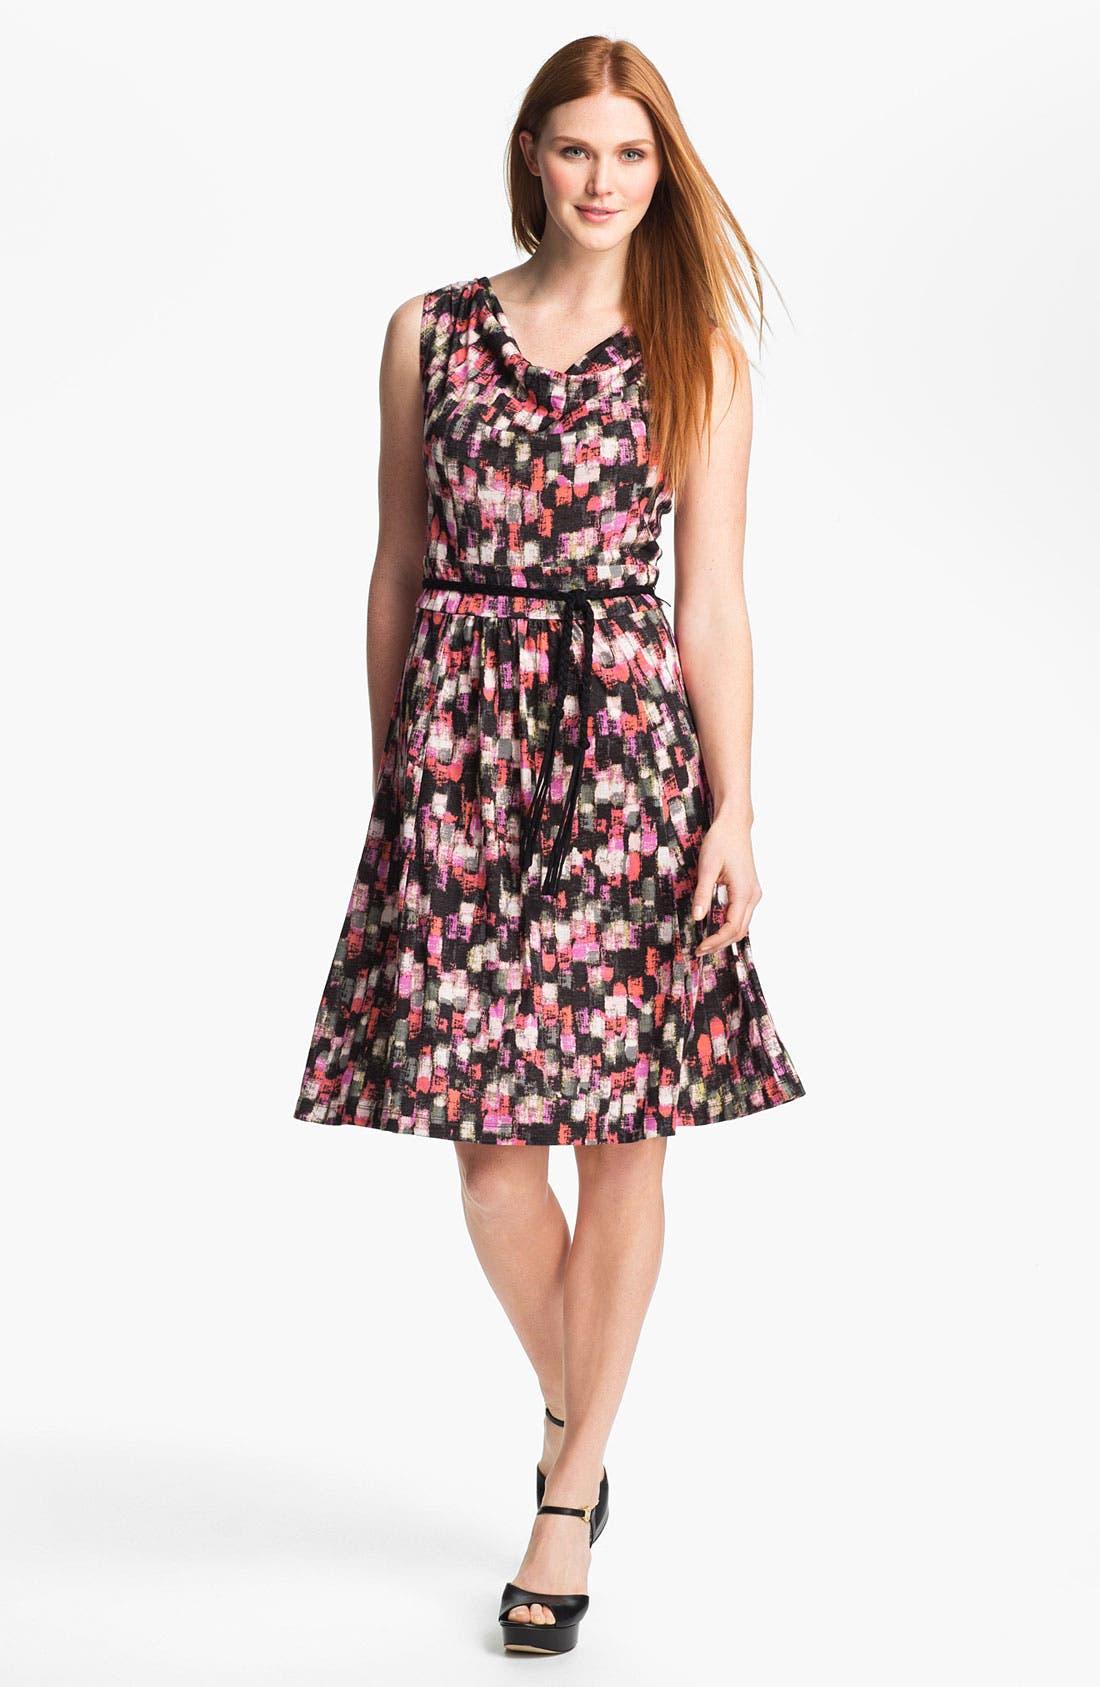 Alternate Image 1 Selected - Nic + Zoe 'Spring Rain' Dress